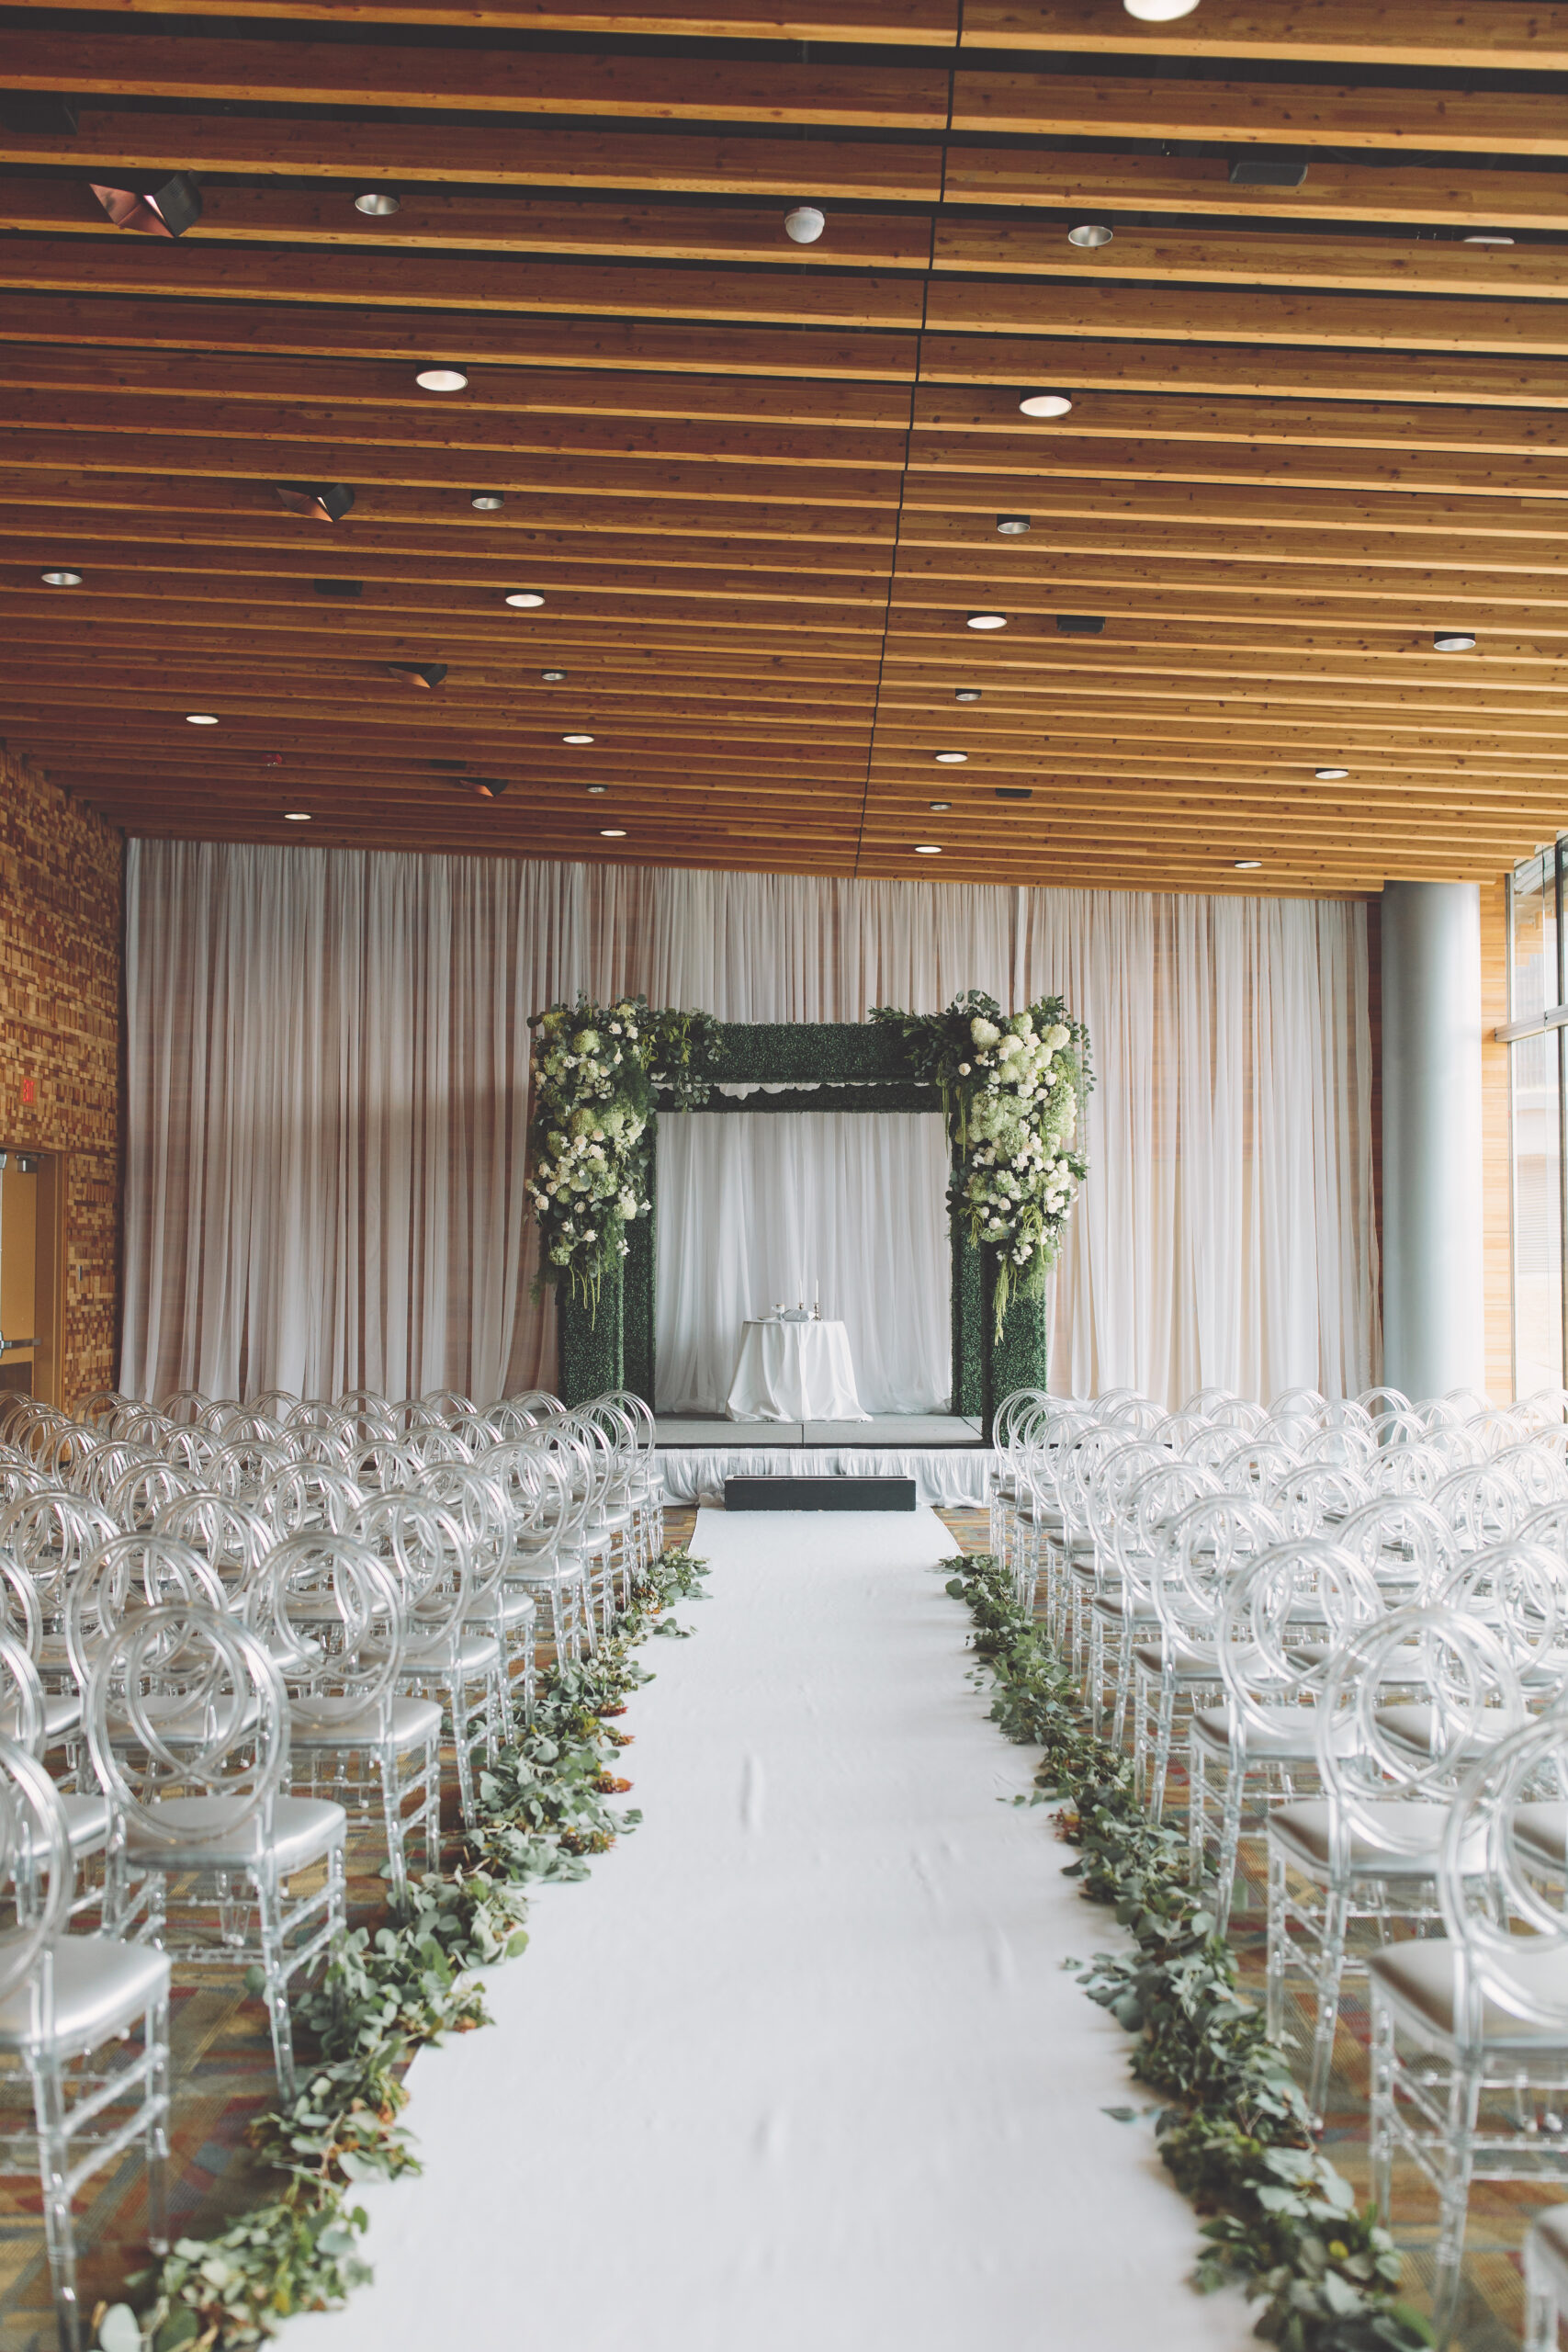 https://secureservercdn.net/45.40.145.151/kgq.ab5.myftpupload.com/wp-content/uploads/2020/04/Amanda-Daniel-Wedding-0393-scaled.jpg?time=1634407926